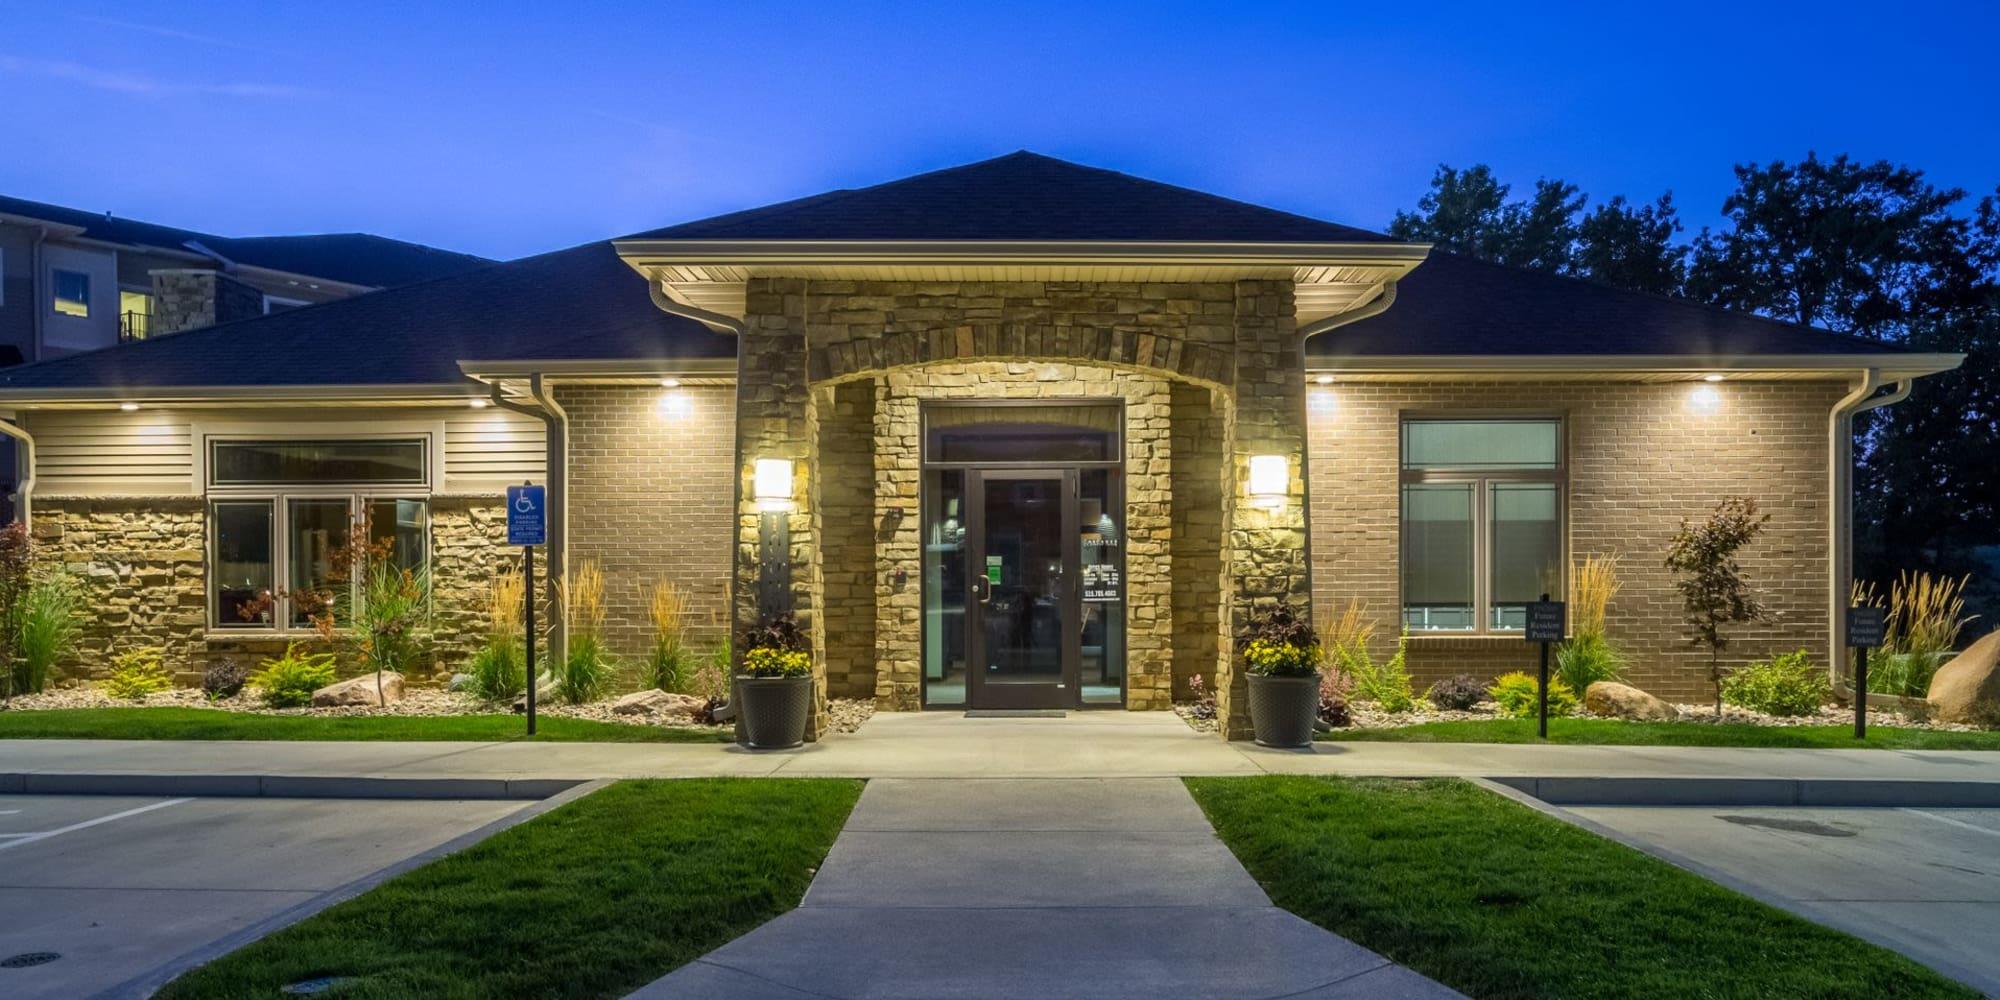 The Cascades at Jordan Creek apartments in West Des Moines, Iowa